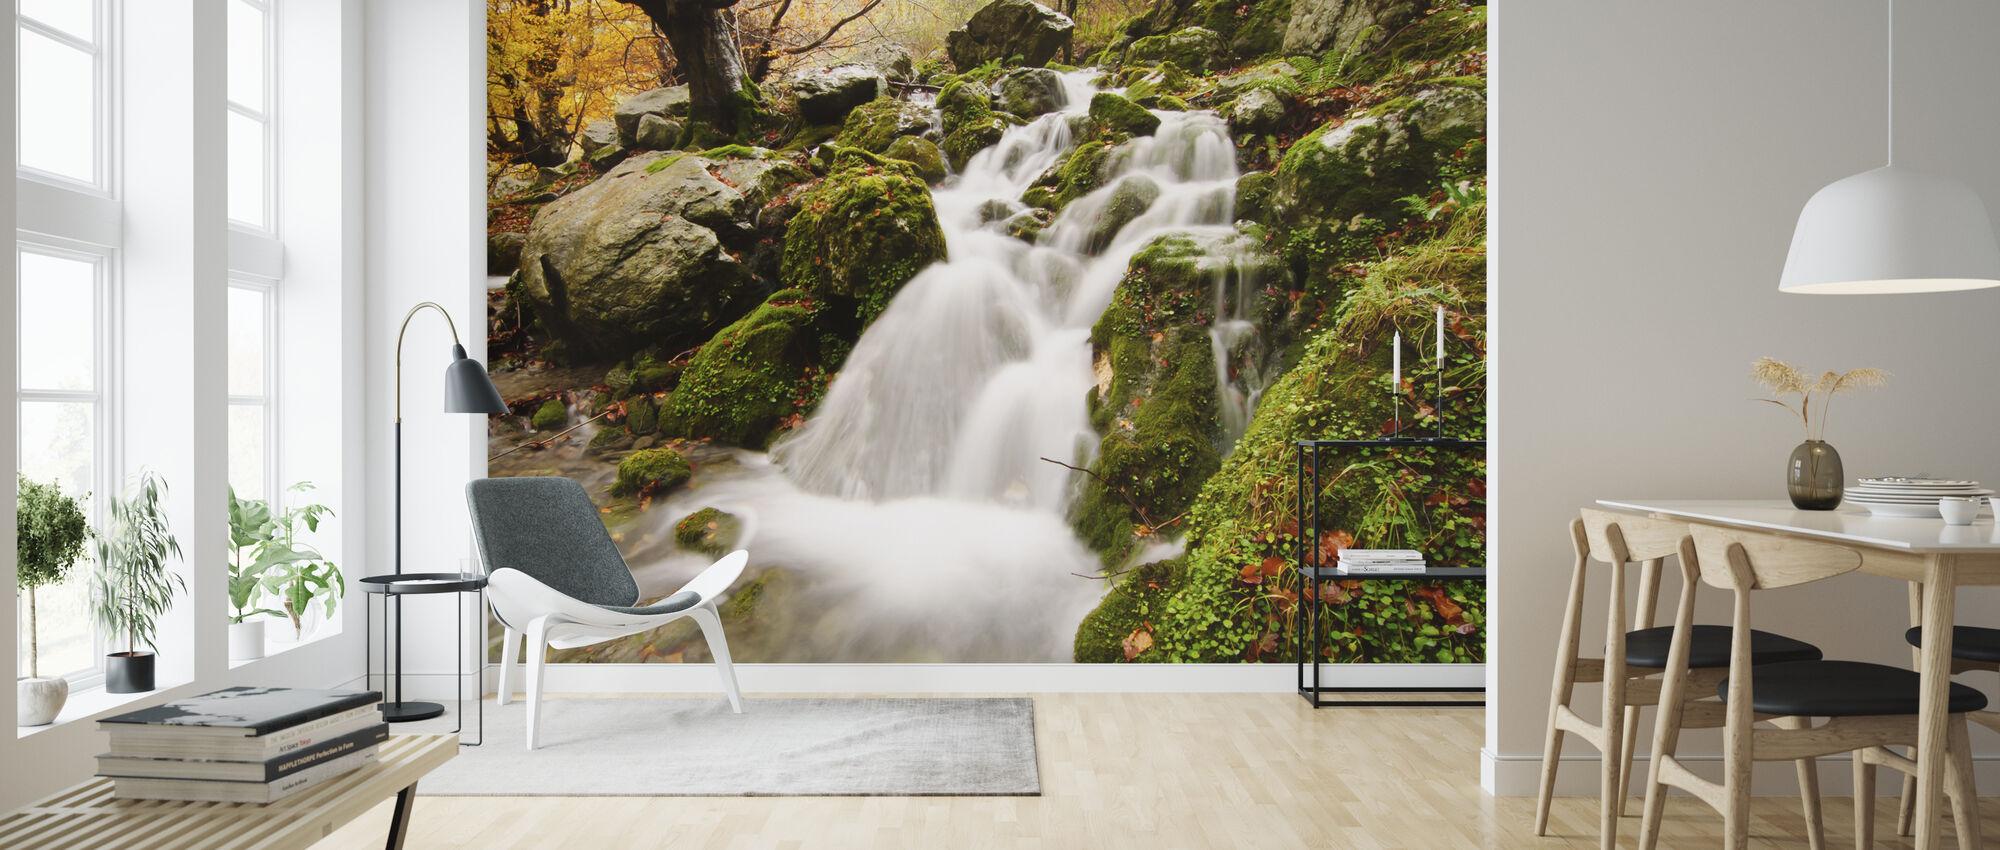 Waterfall of Collados del Ason - Wallpaper - Living Room